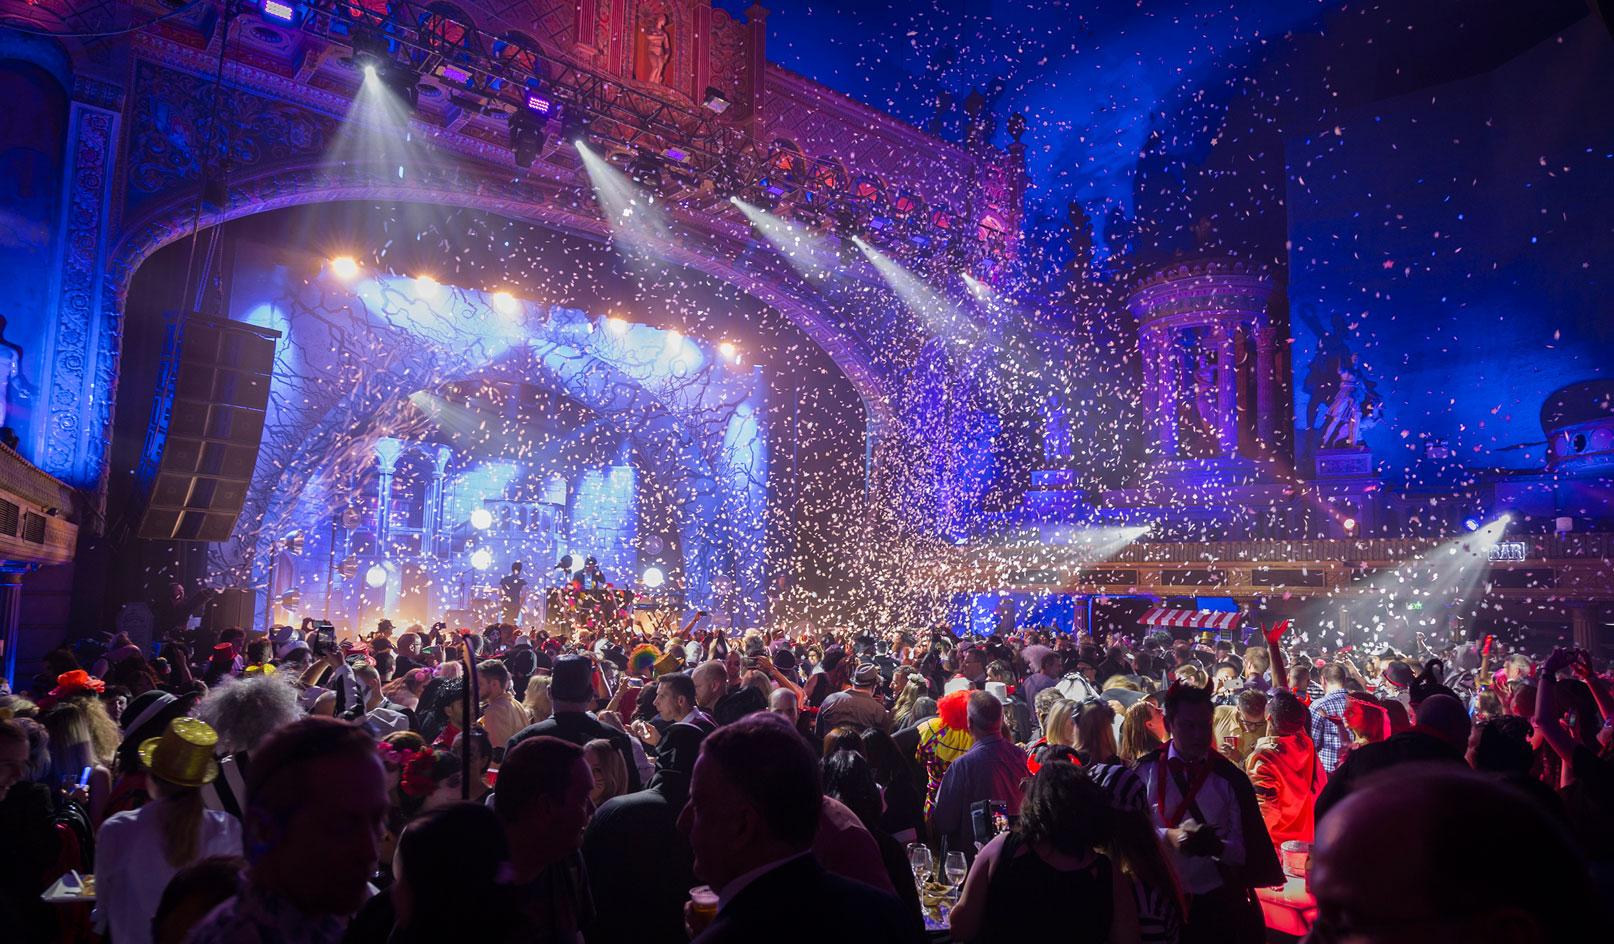 <div>Events</div><div> <a href='https://www.nedmeldrum.com.au/project/kmart-christmas-party/'>View Series</a></div>